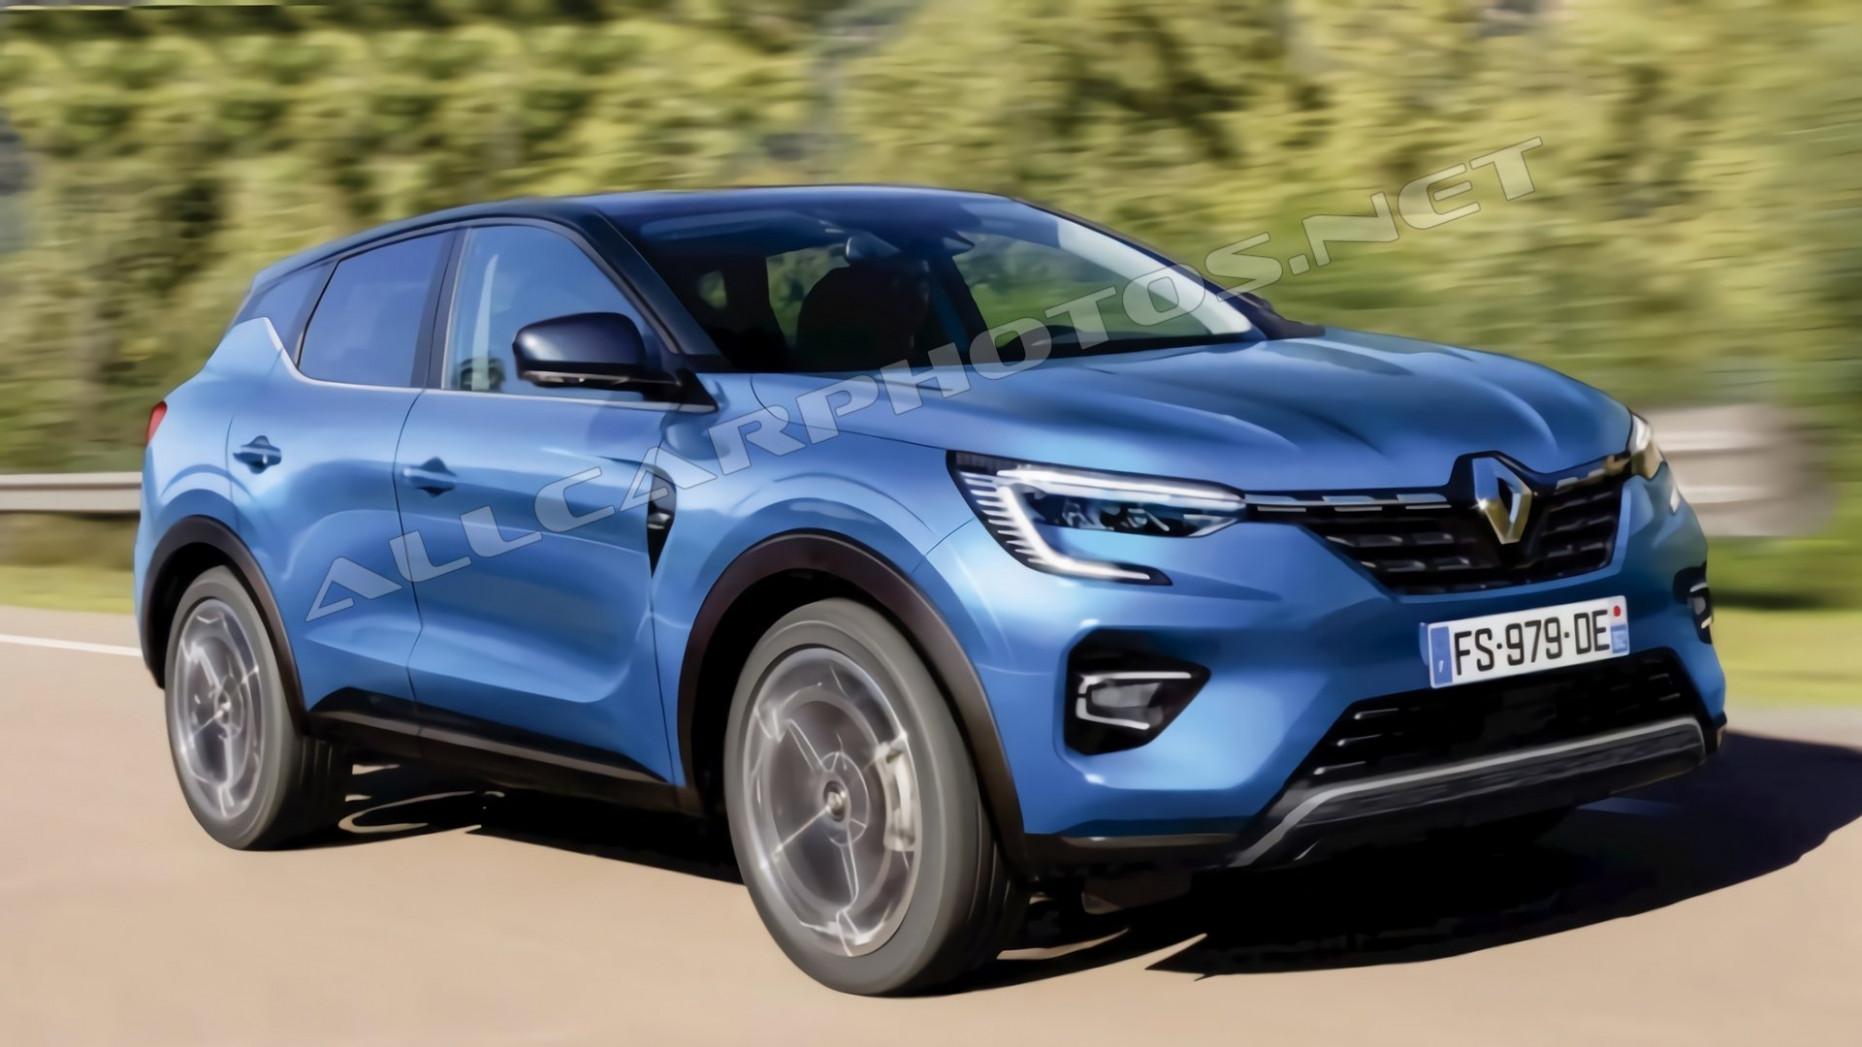 Rumors 2022 Renault Kadjar